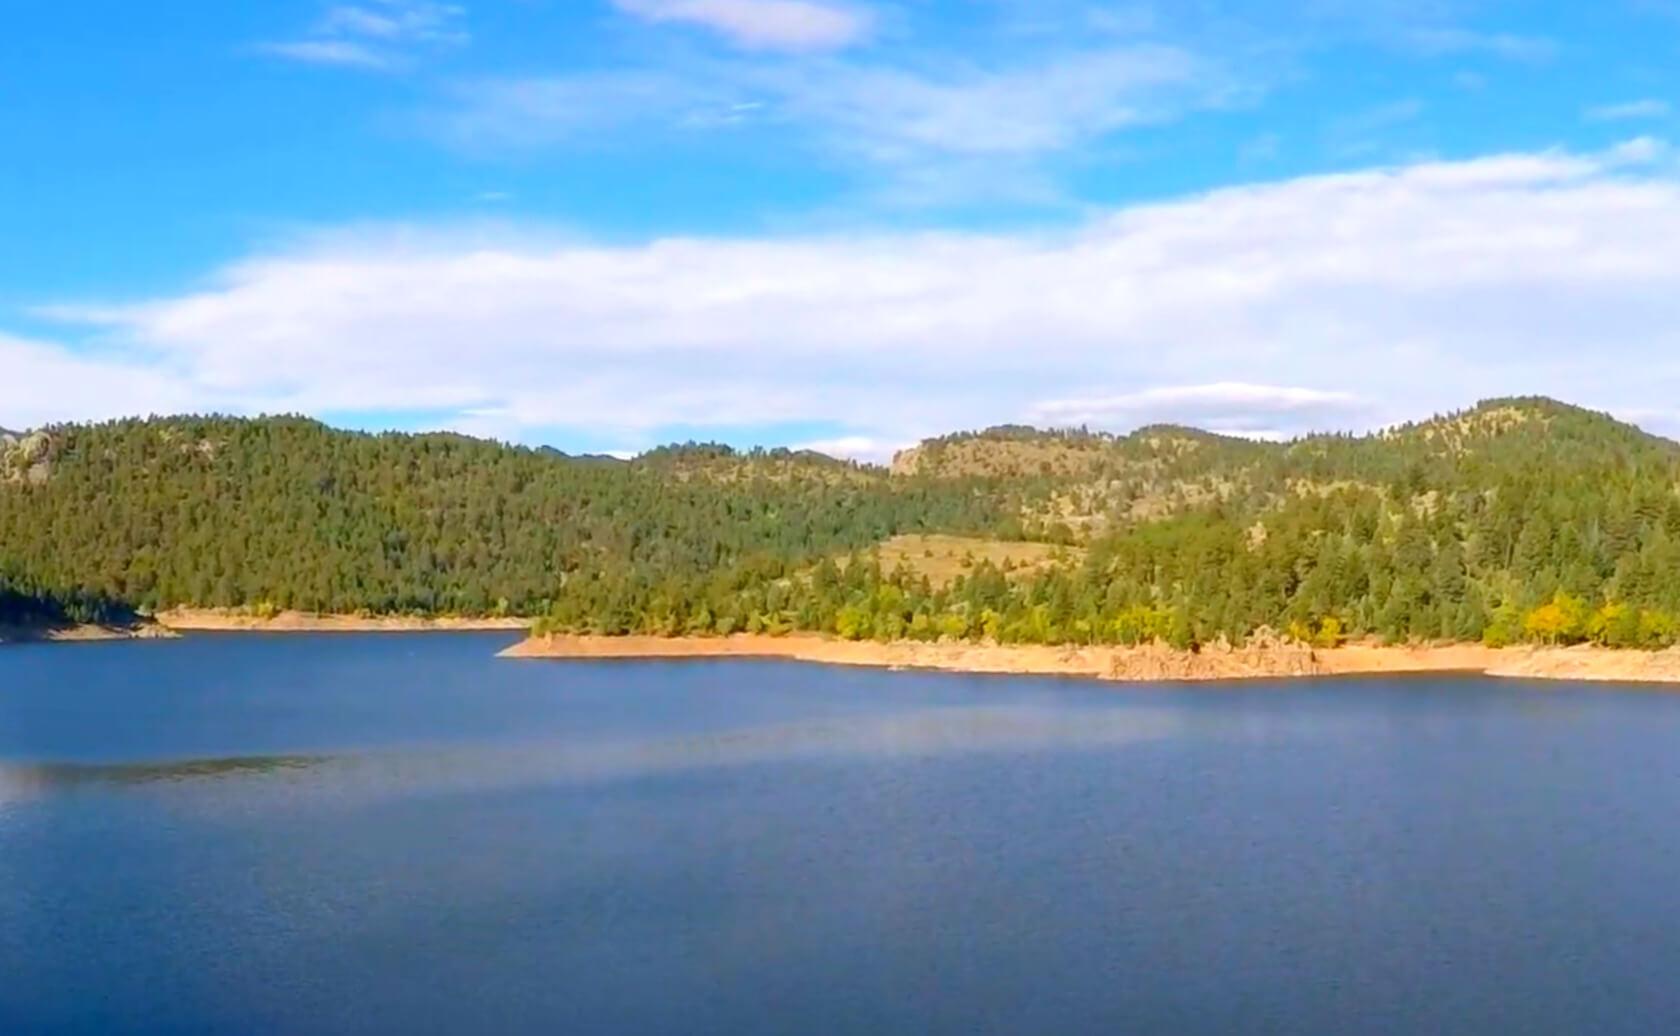 Gross-Lake-Fishing-Guide-Report-Colorado-08